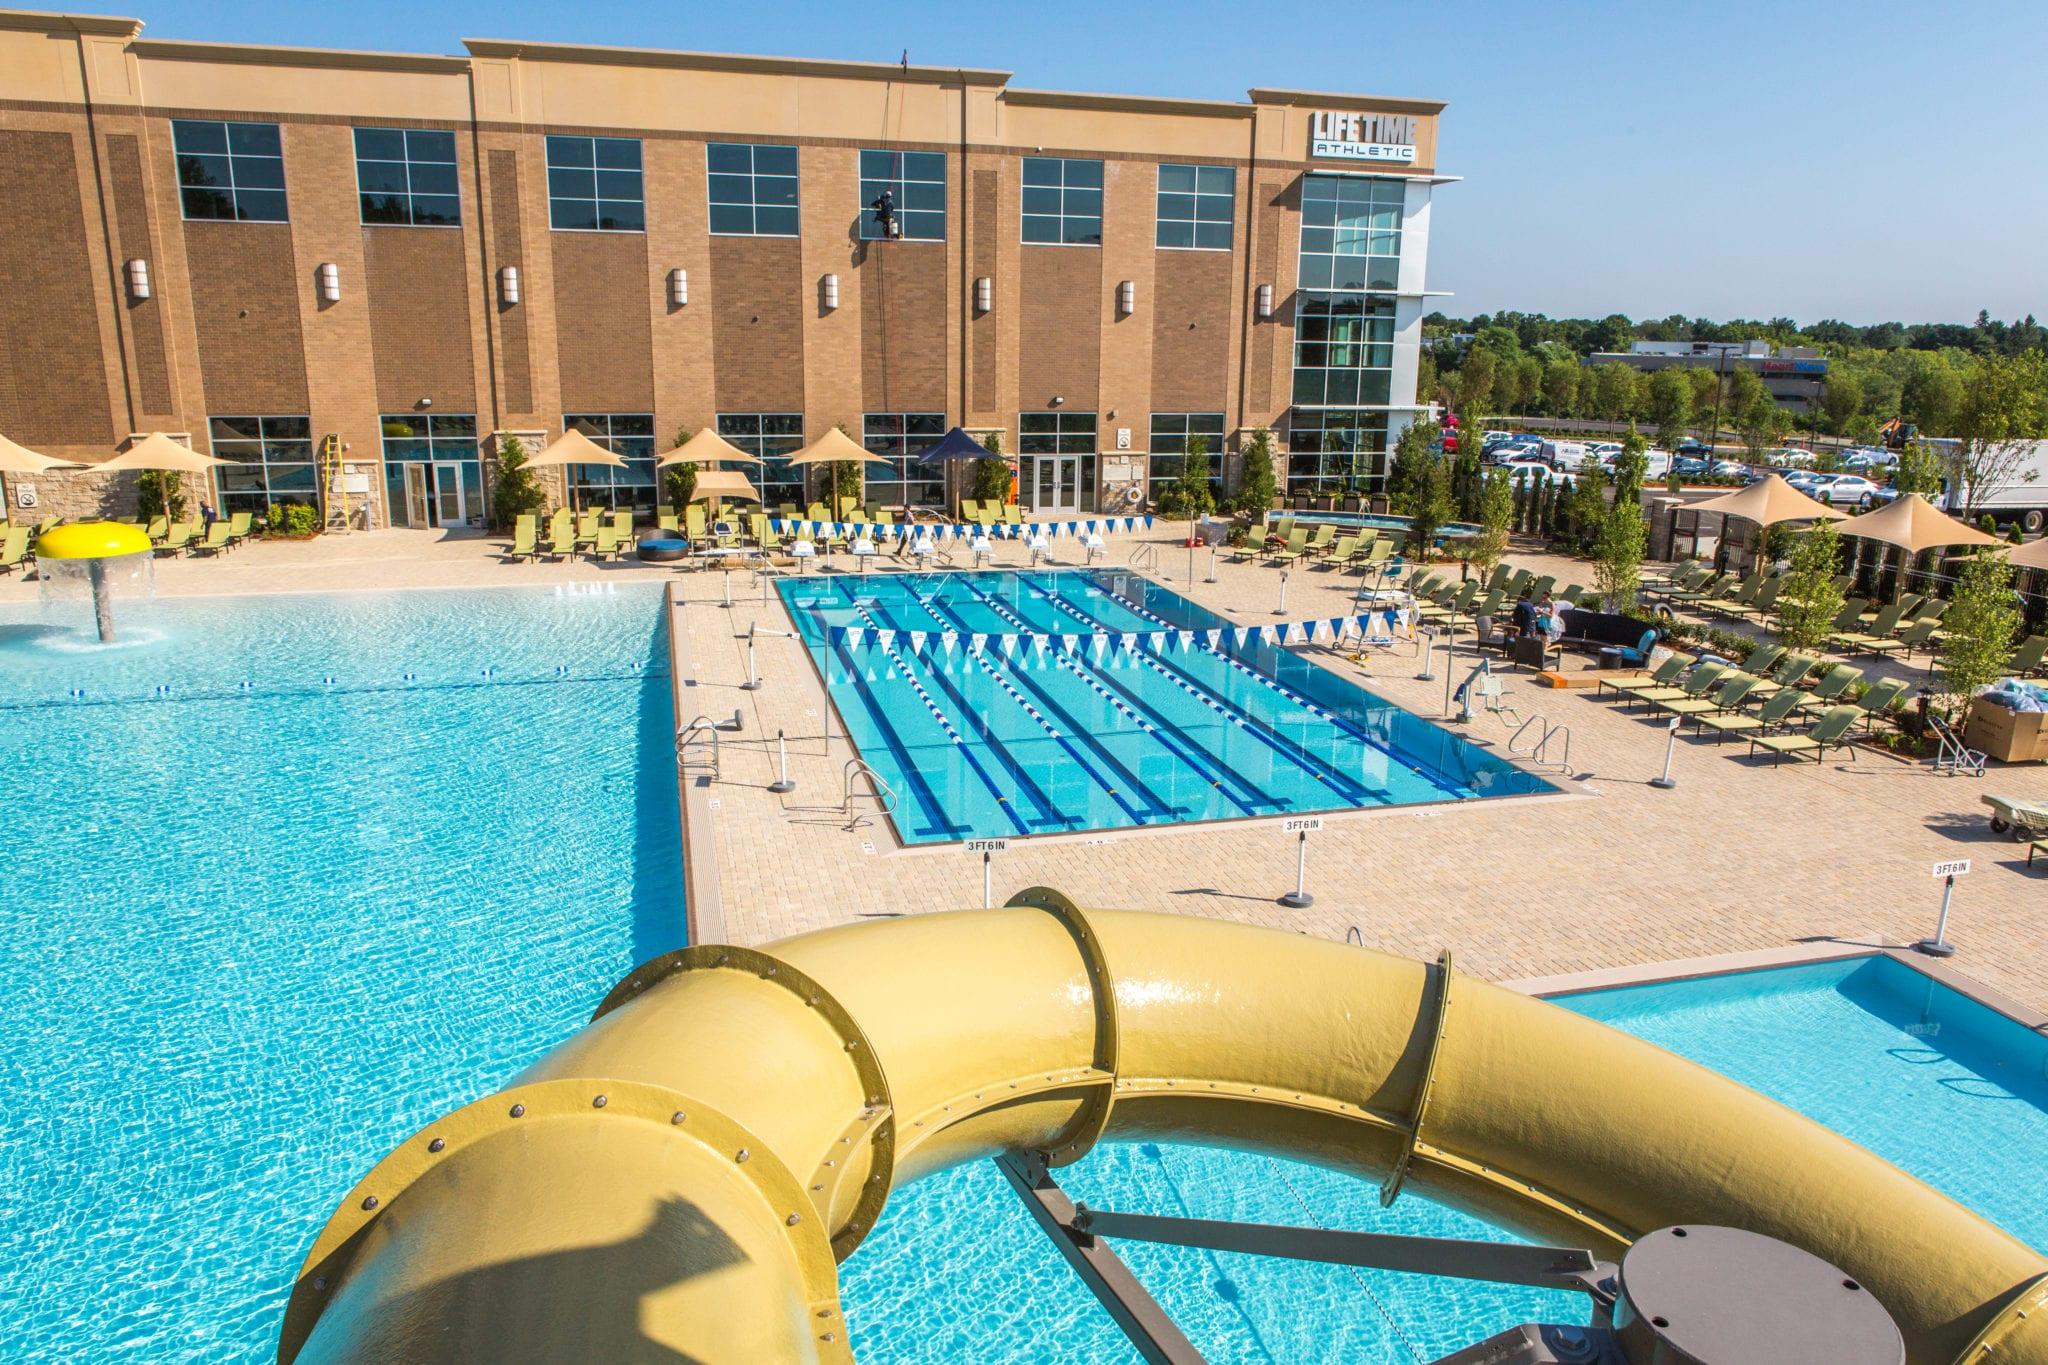 new hampshire pool company